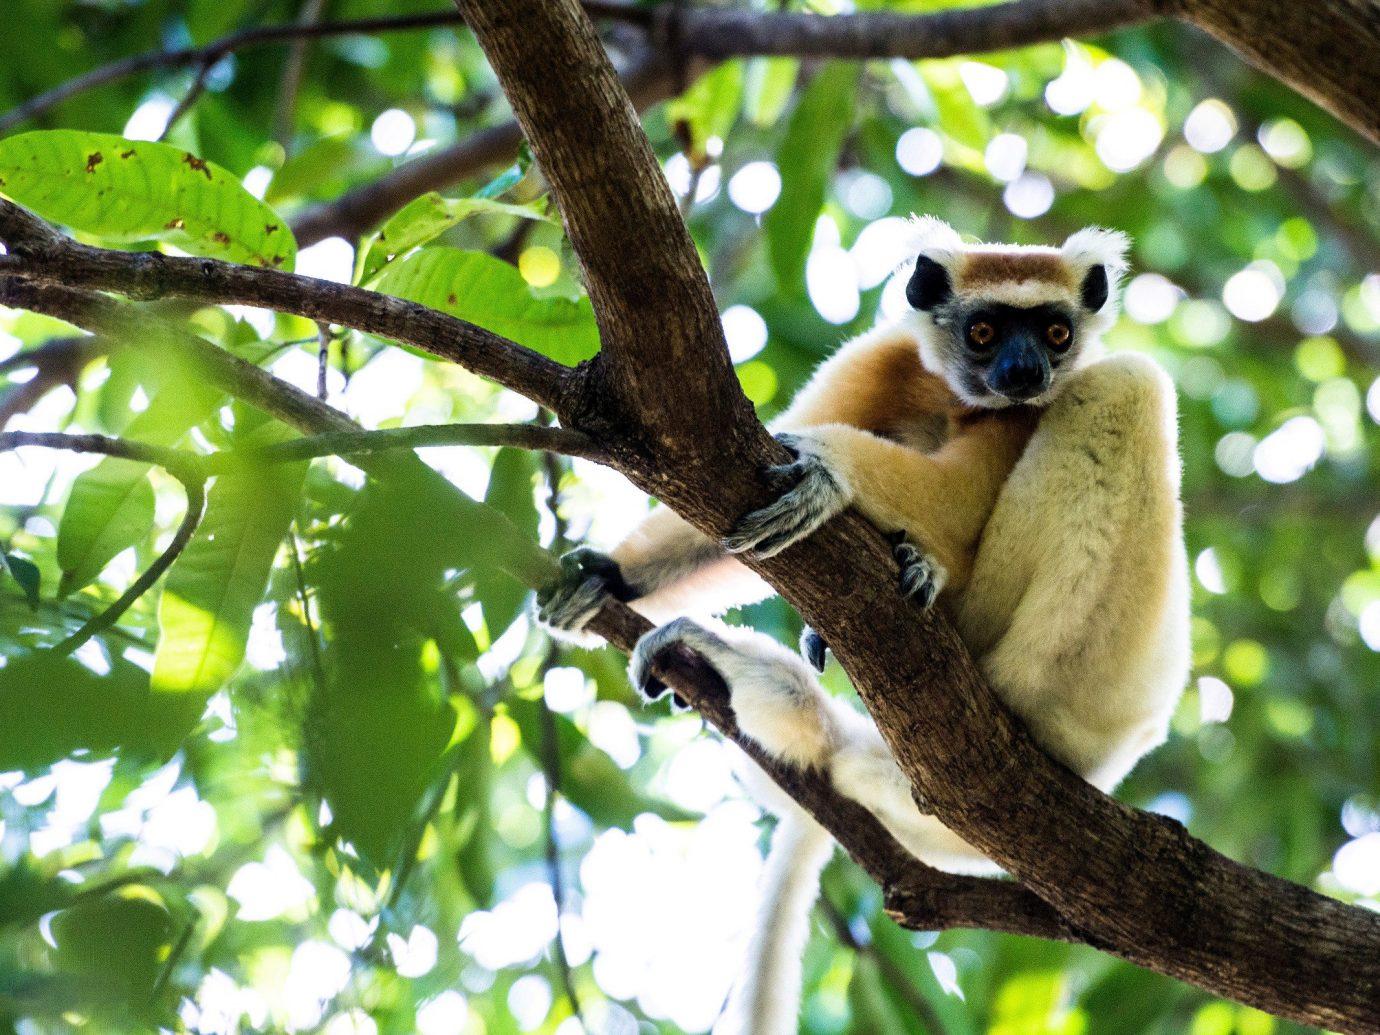 Trip Ideas tree mammal outdoor animal primate sitting fauna branch leaf lemur Wildlife Jungle perched organism new world monkey terrestrial animal indri rainforest gibbon snout old world monkey Forest